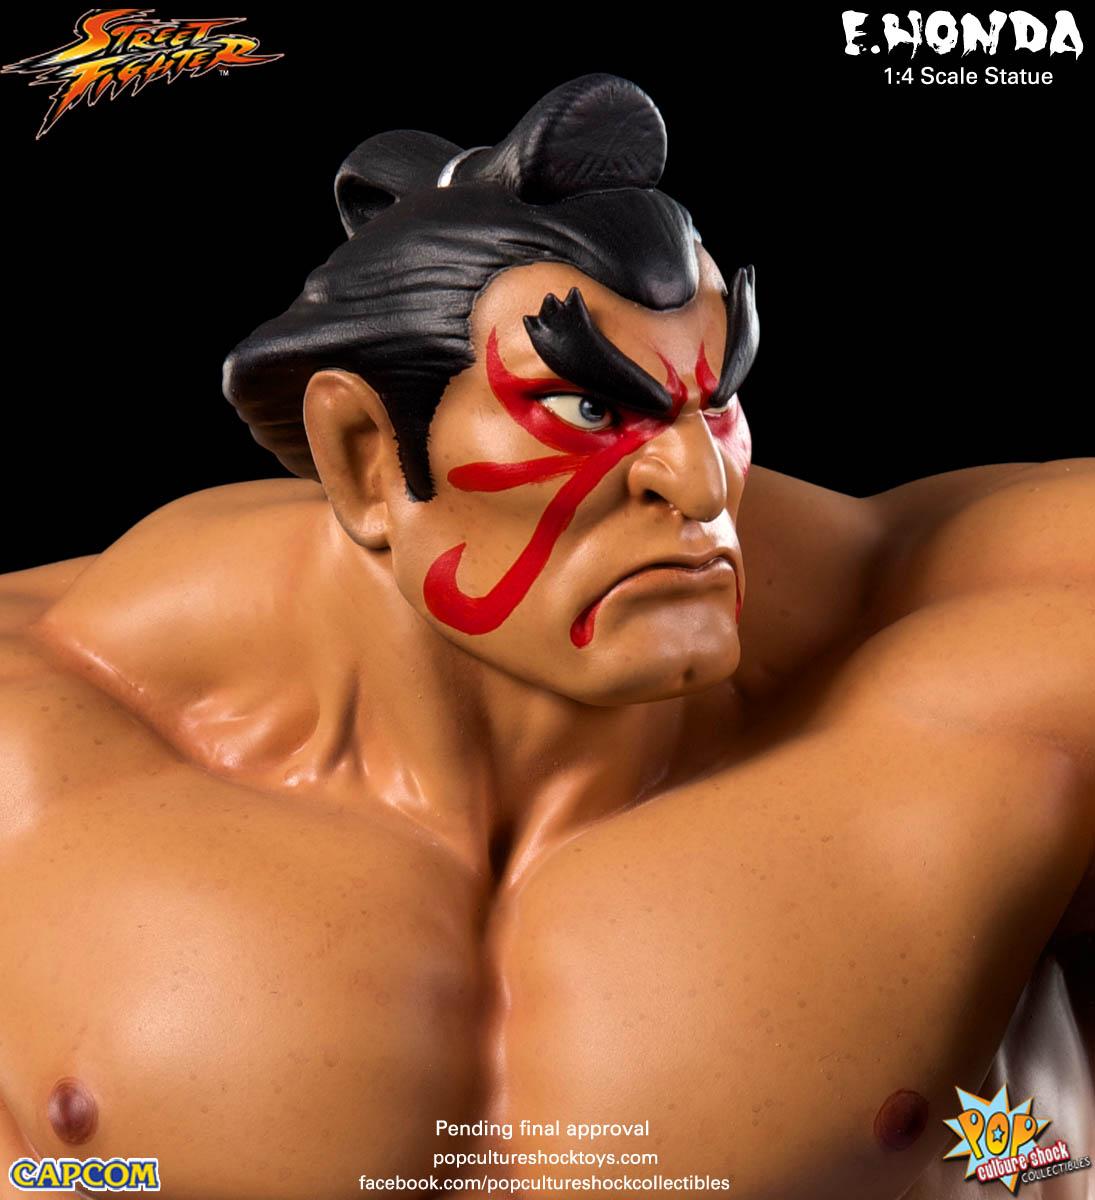 [Pop Culture Shock] Street Fighter: E. Honda 1/4 Statue - Página 3 Street-Fighter-E.-Honda-Regular-Statue-001